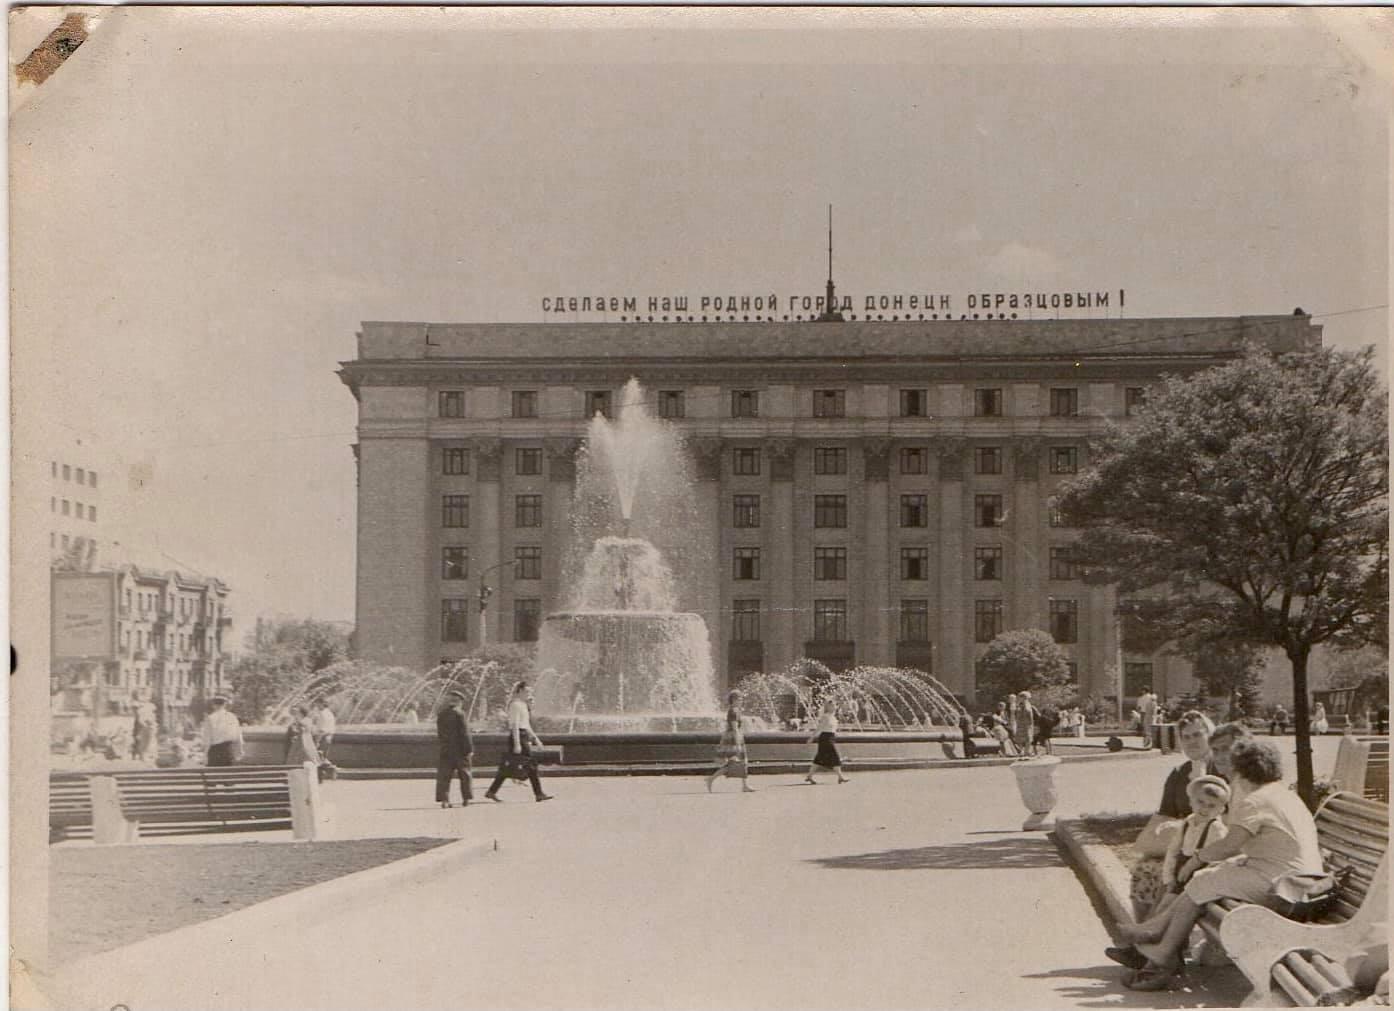 donetsk_ploschad_fontan_1960